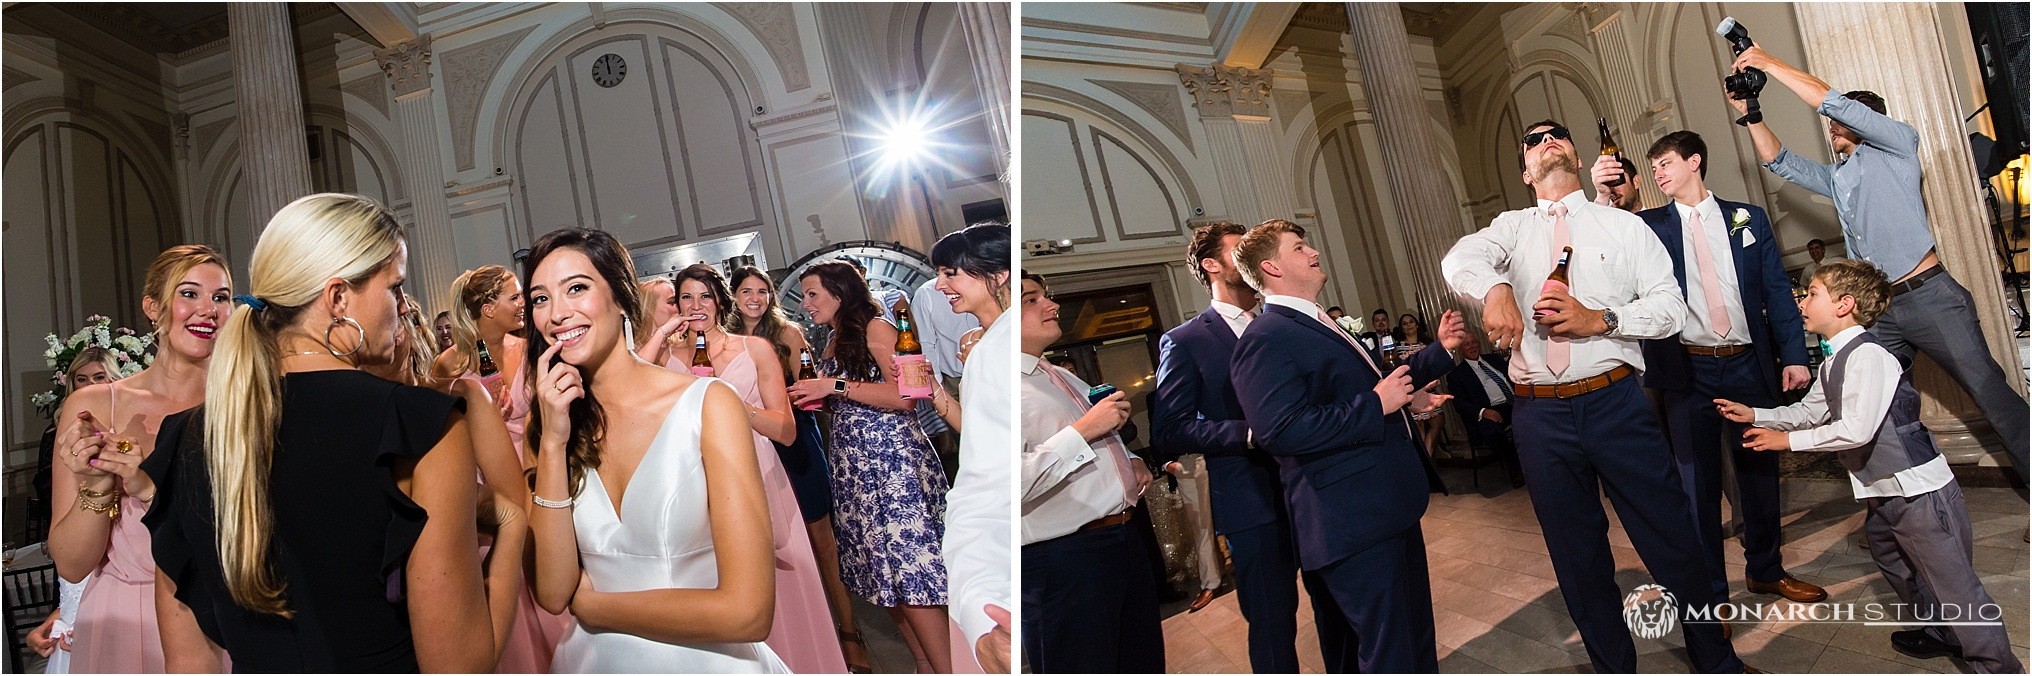 st-augustine-wedding-photographer-141.jpg